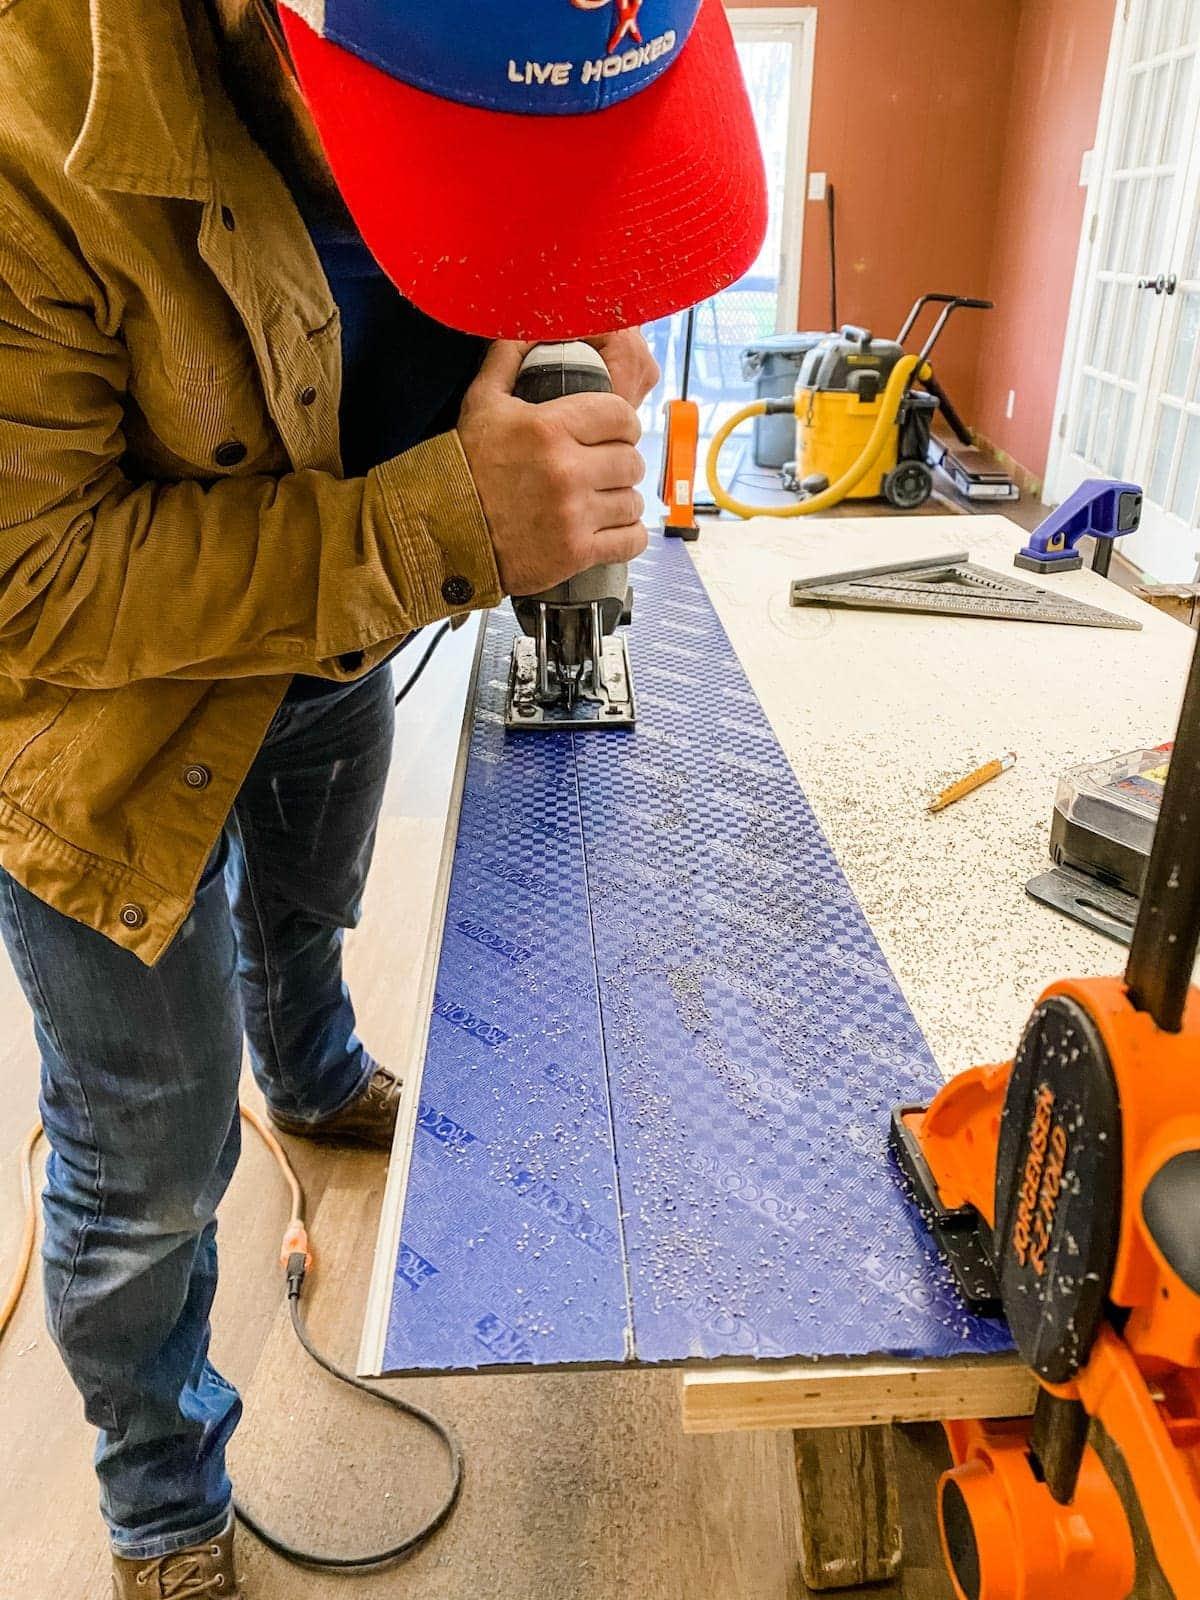 using a jigsaw to cut luxury vinyl plank flooring